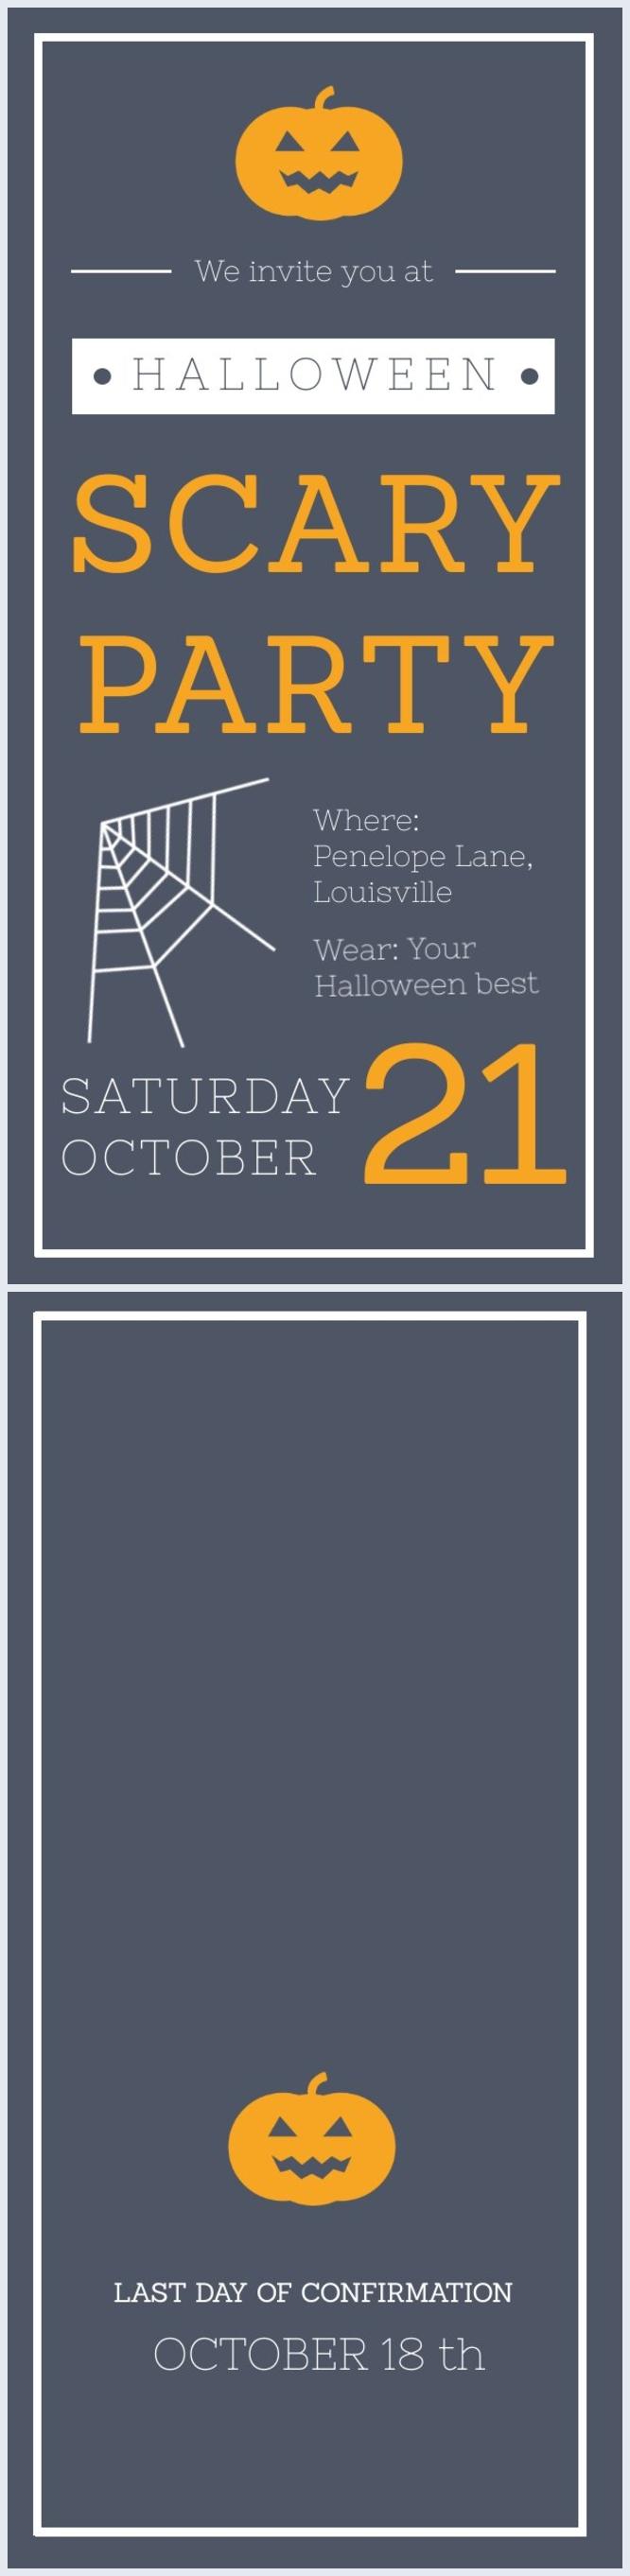 Halloween Scary Party Invitation Design